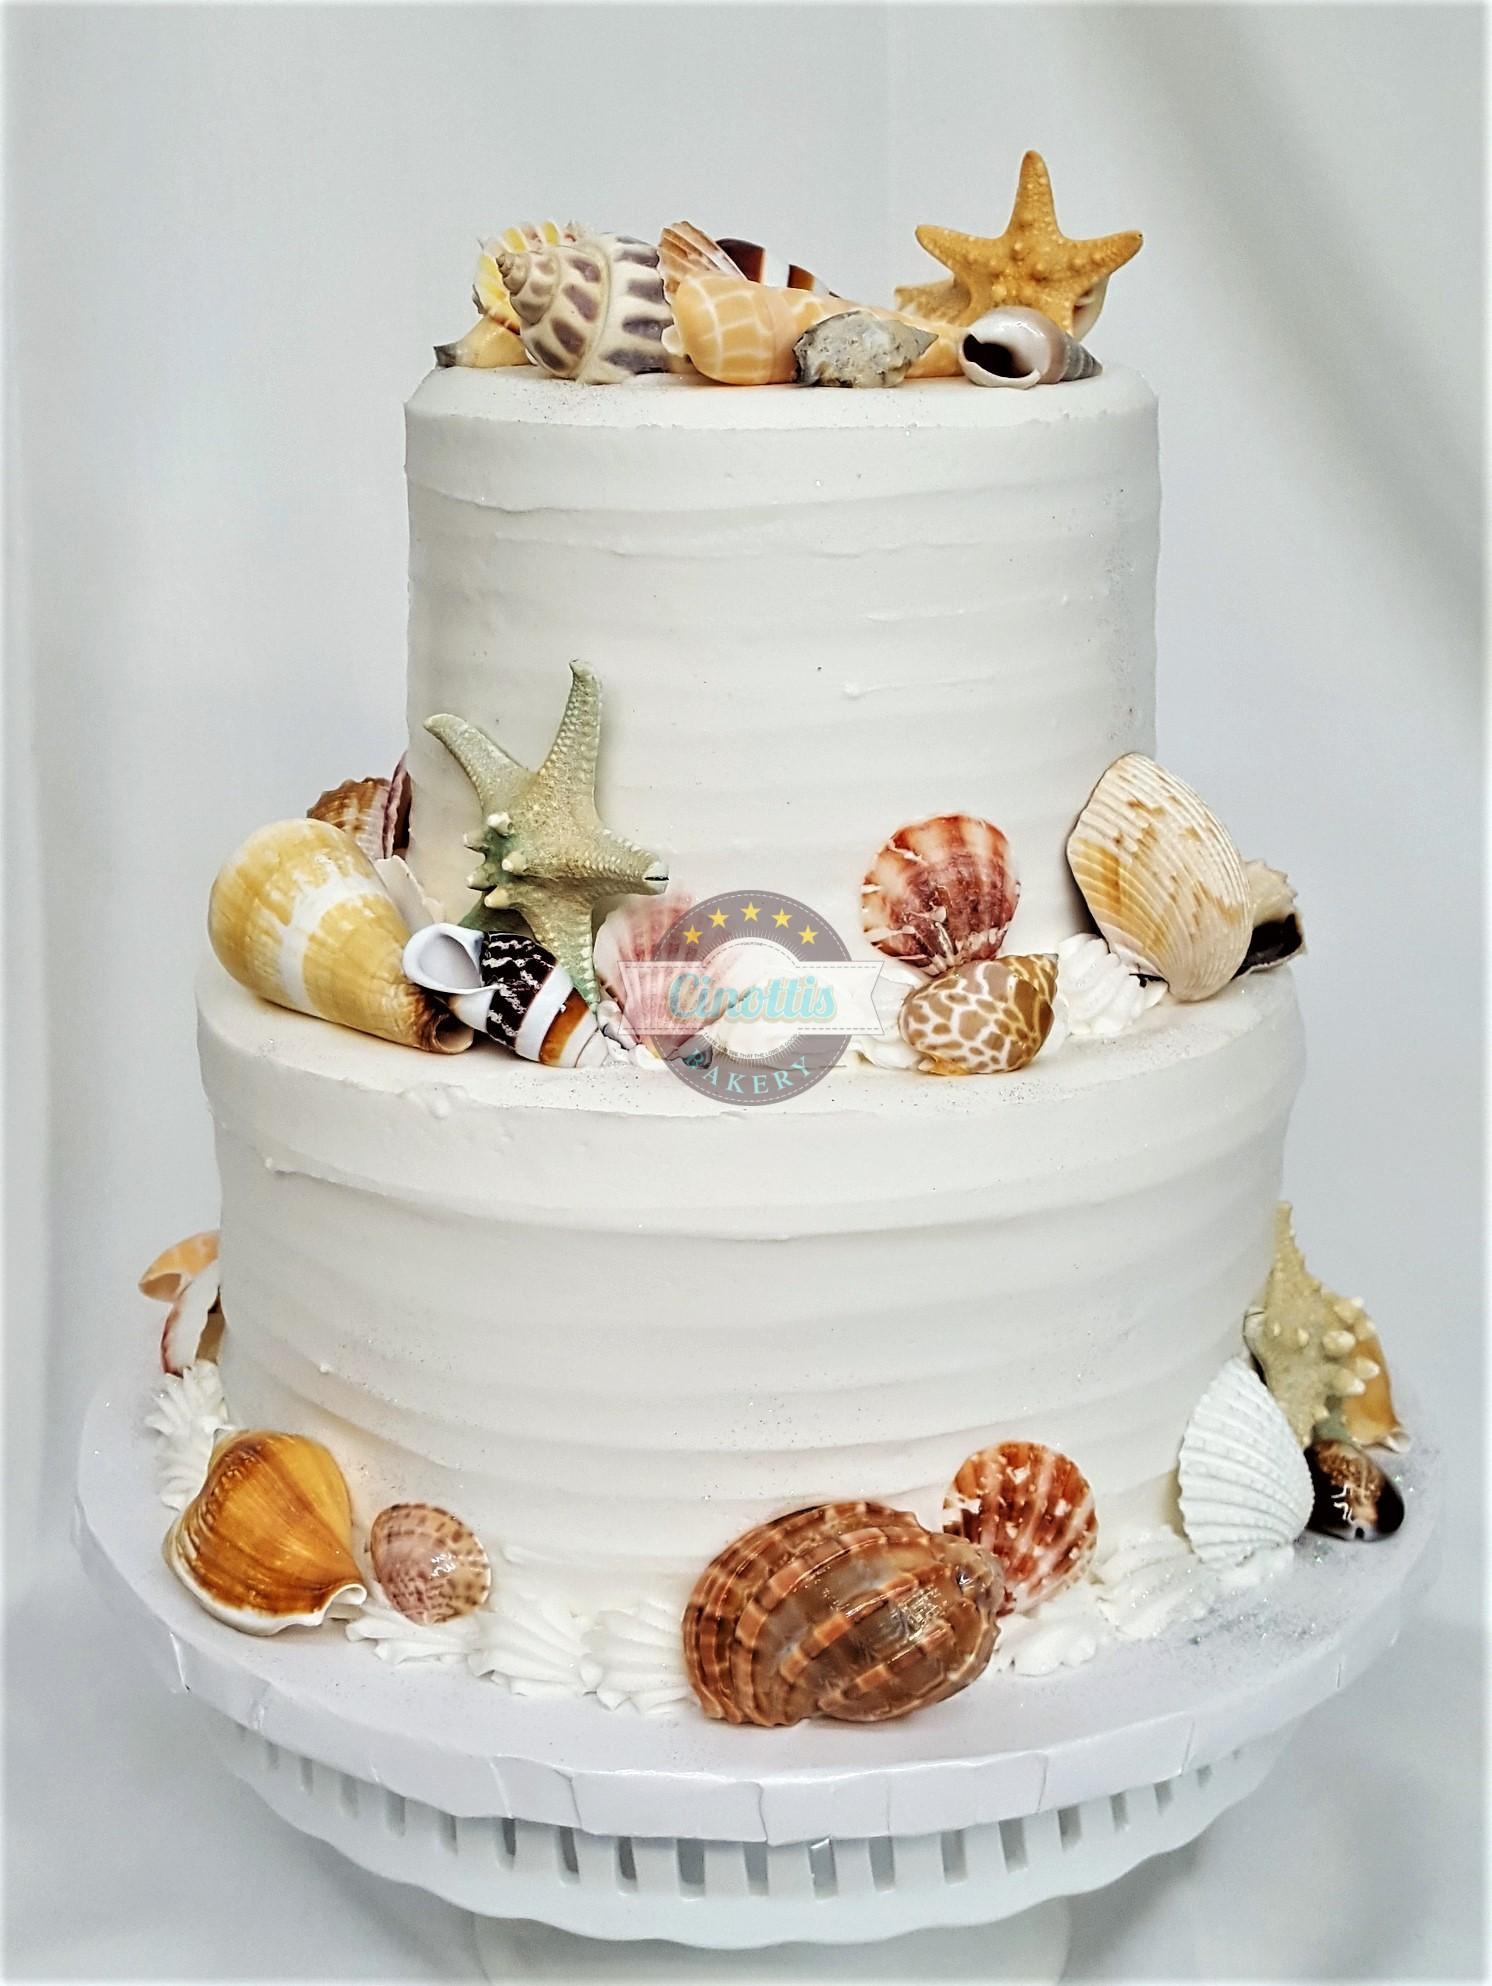 Shells On The Beach Celebration Cake From Cinottis Bakery